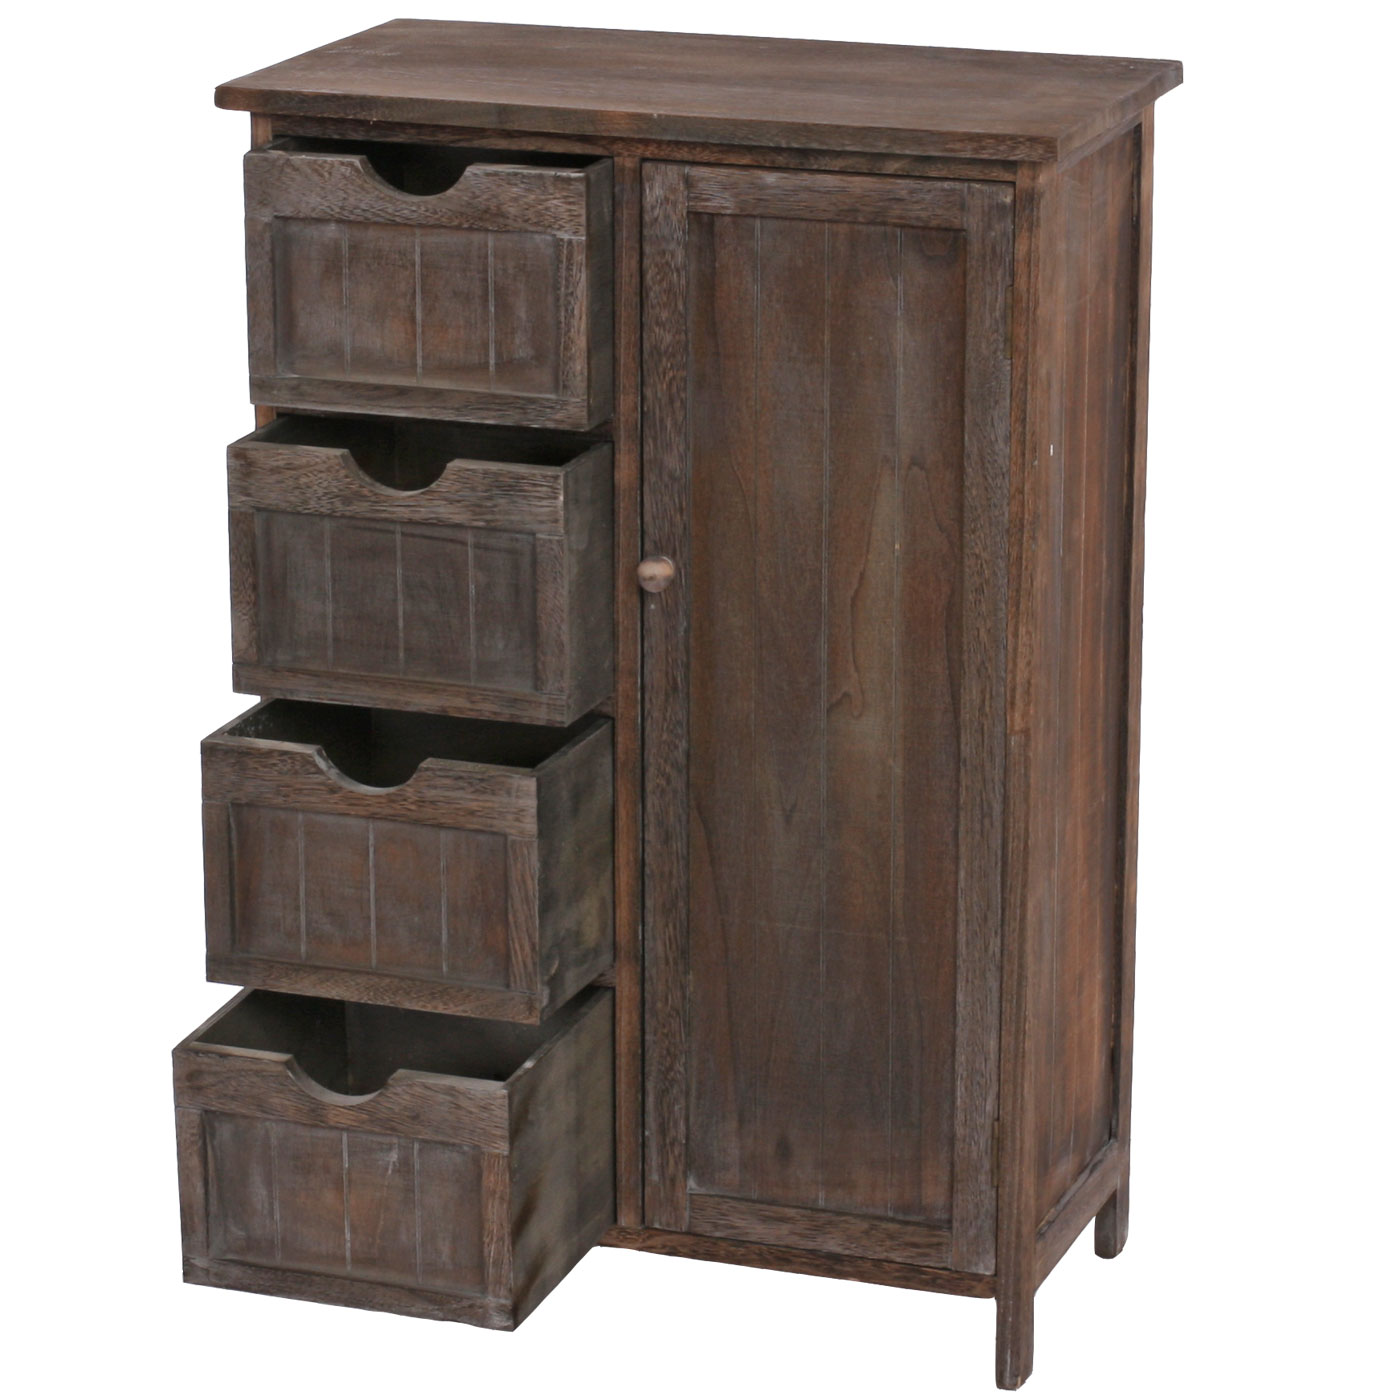 shabby chic kommode vintage braun. Black Bedroom Furniture Sets. Home Design Ideas